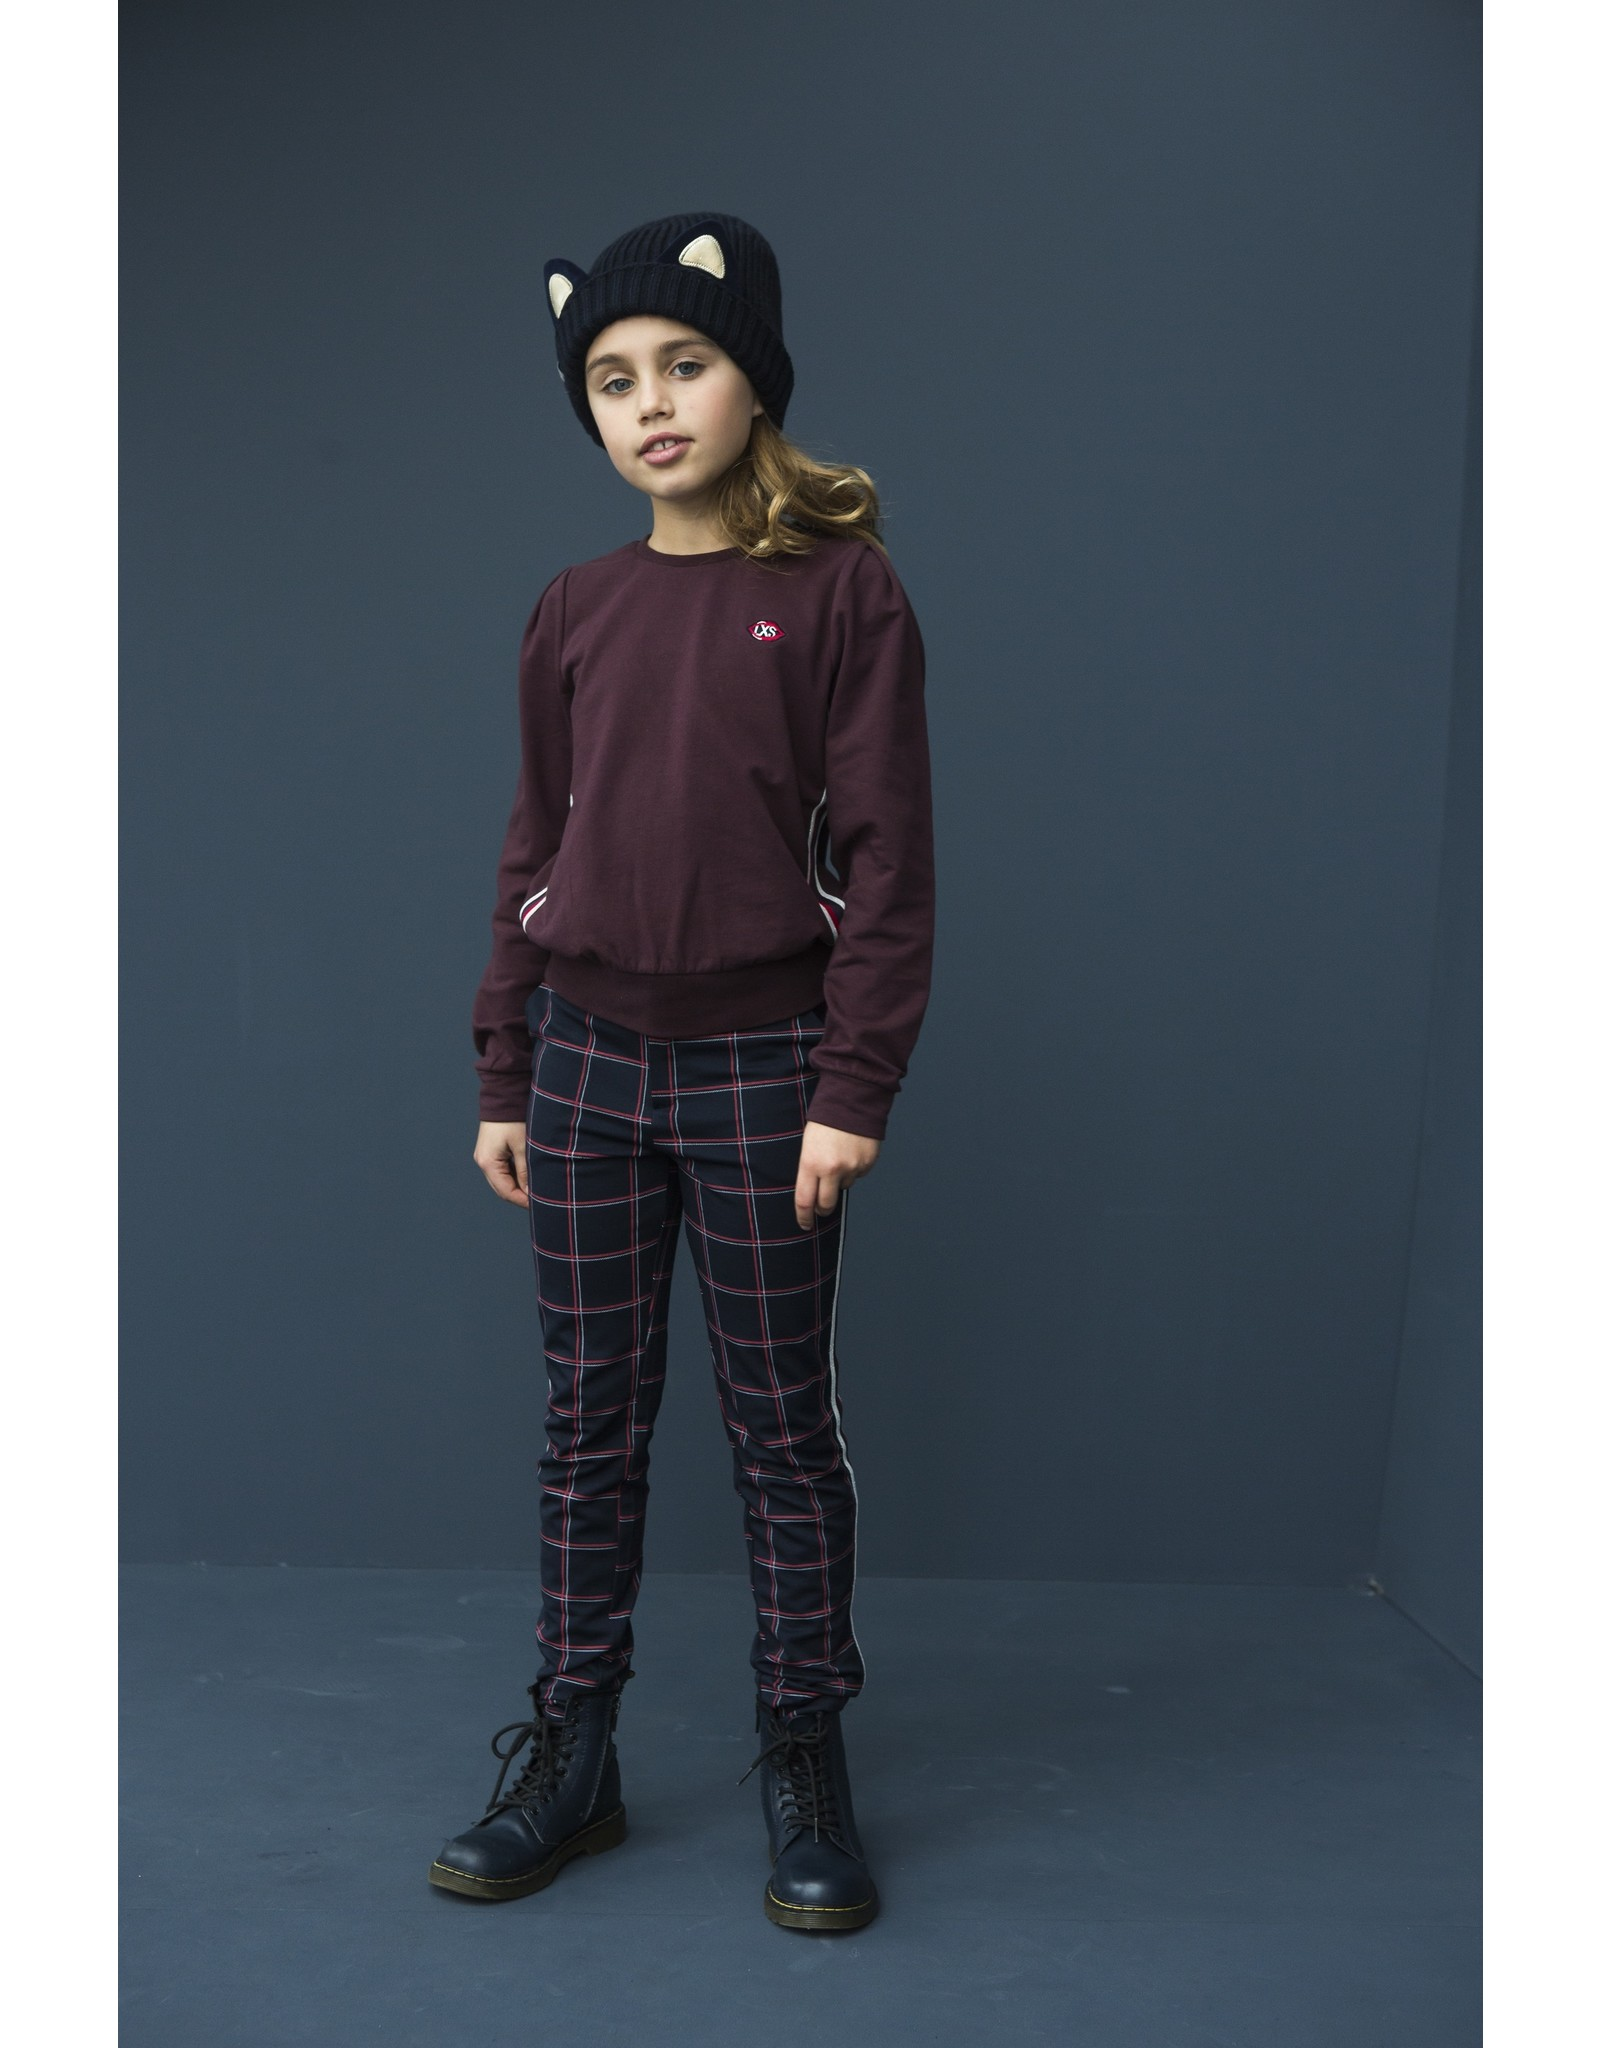 Looxs Revolution Girls hat 4 pcs